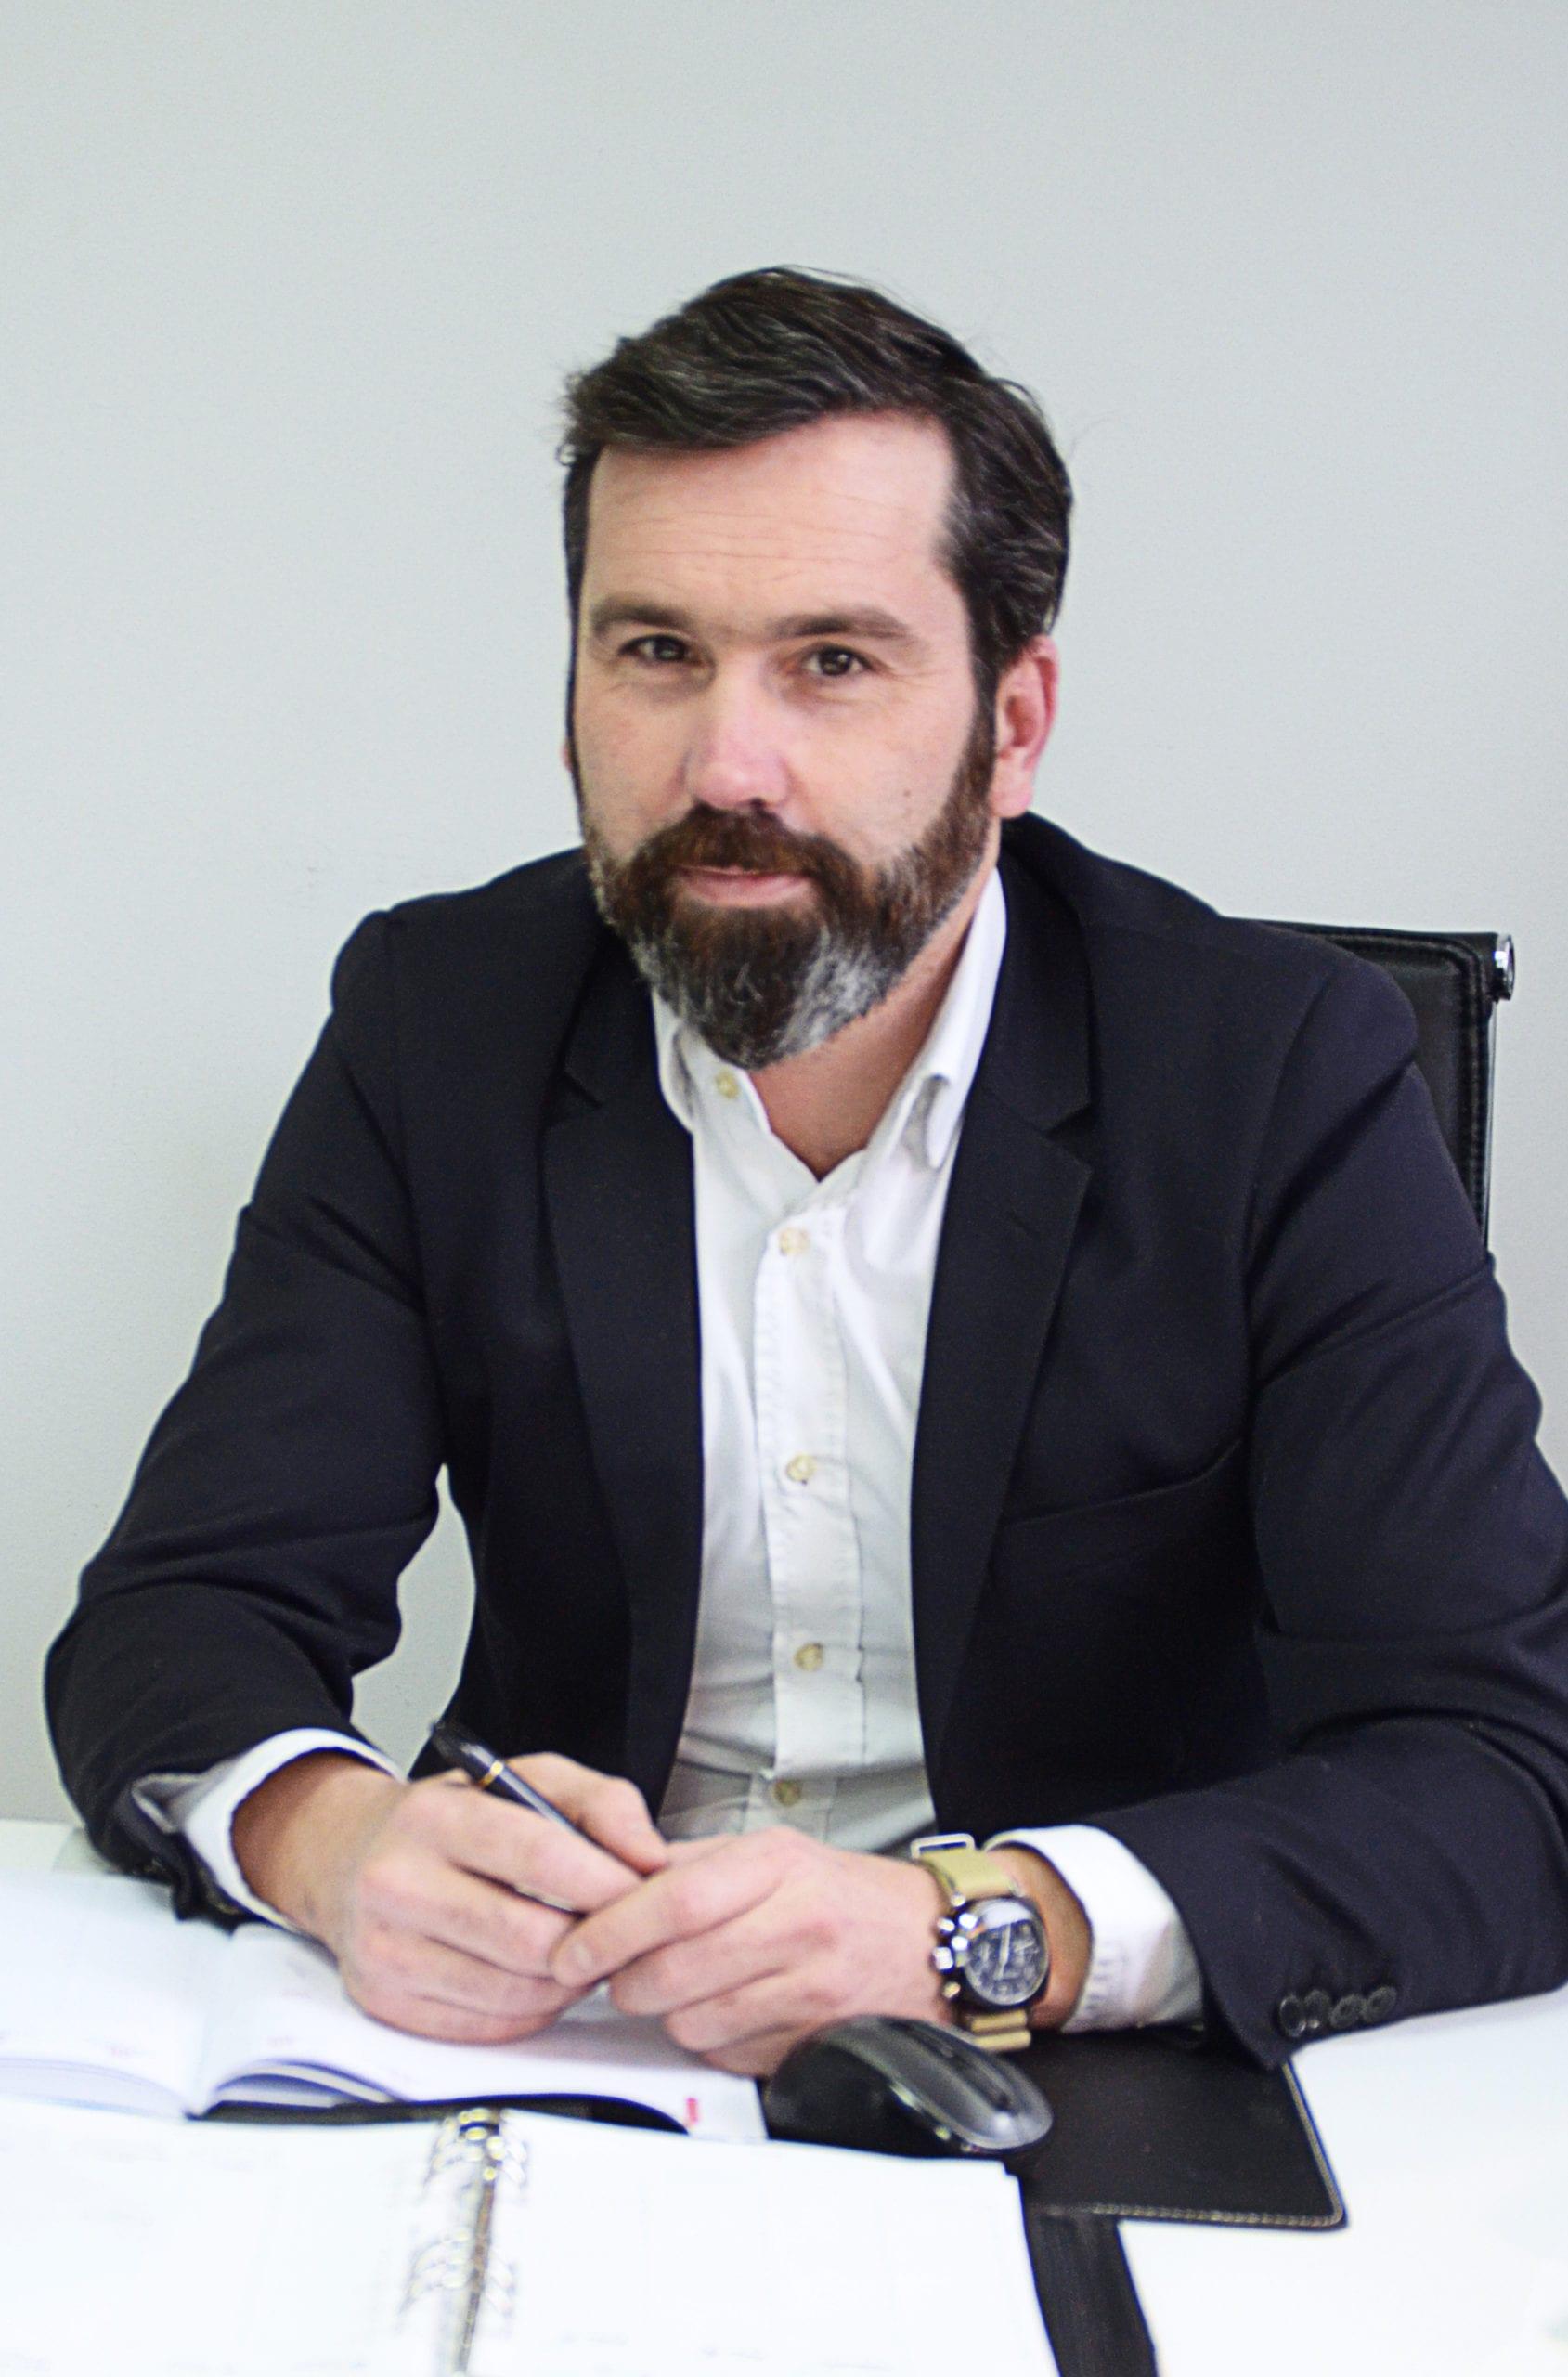 Christophe Jaffry